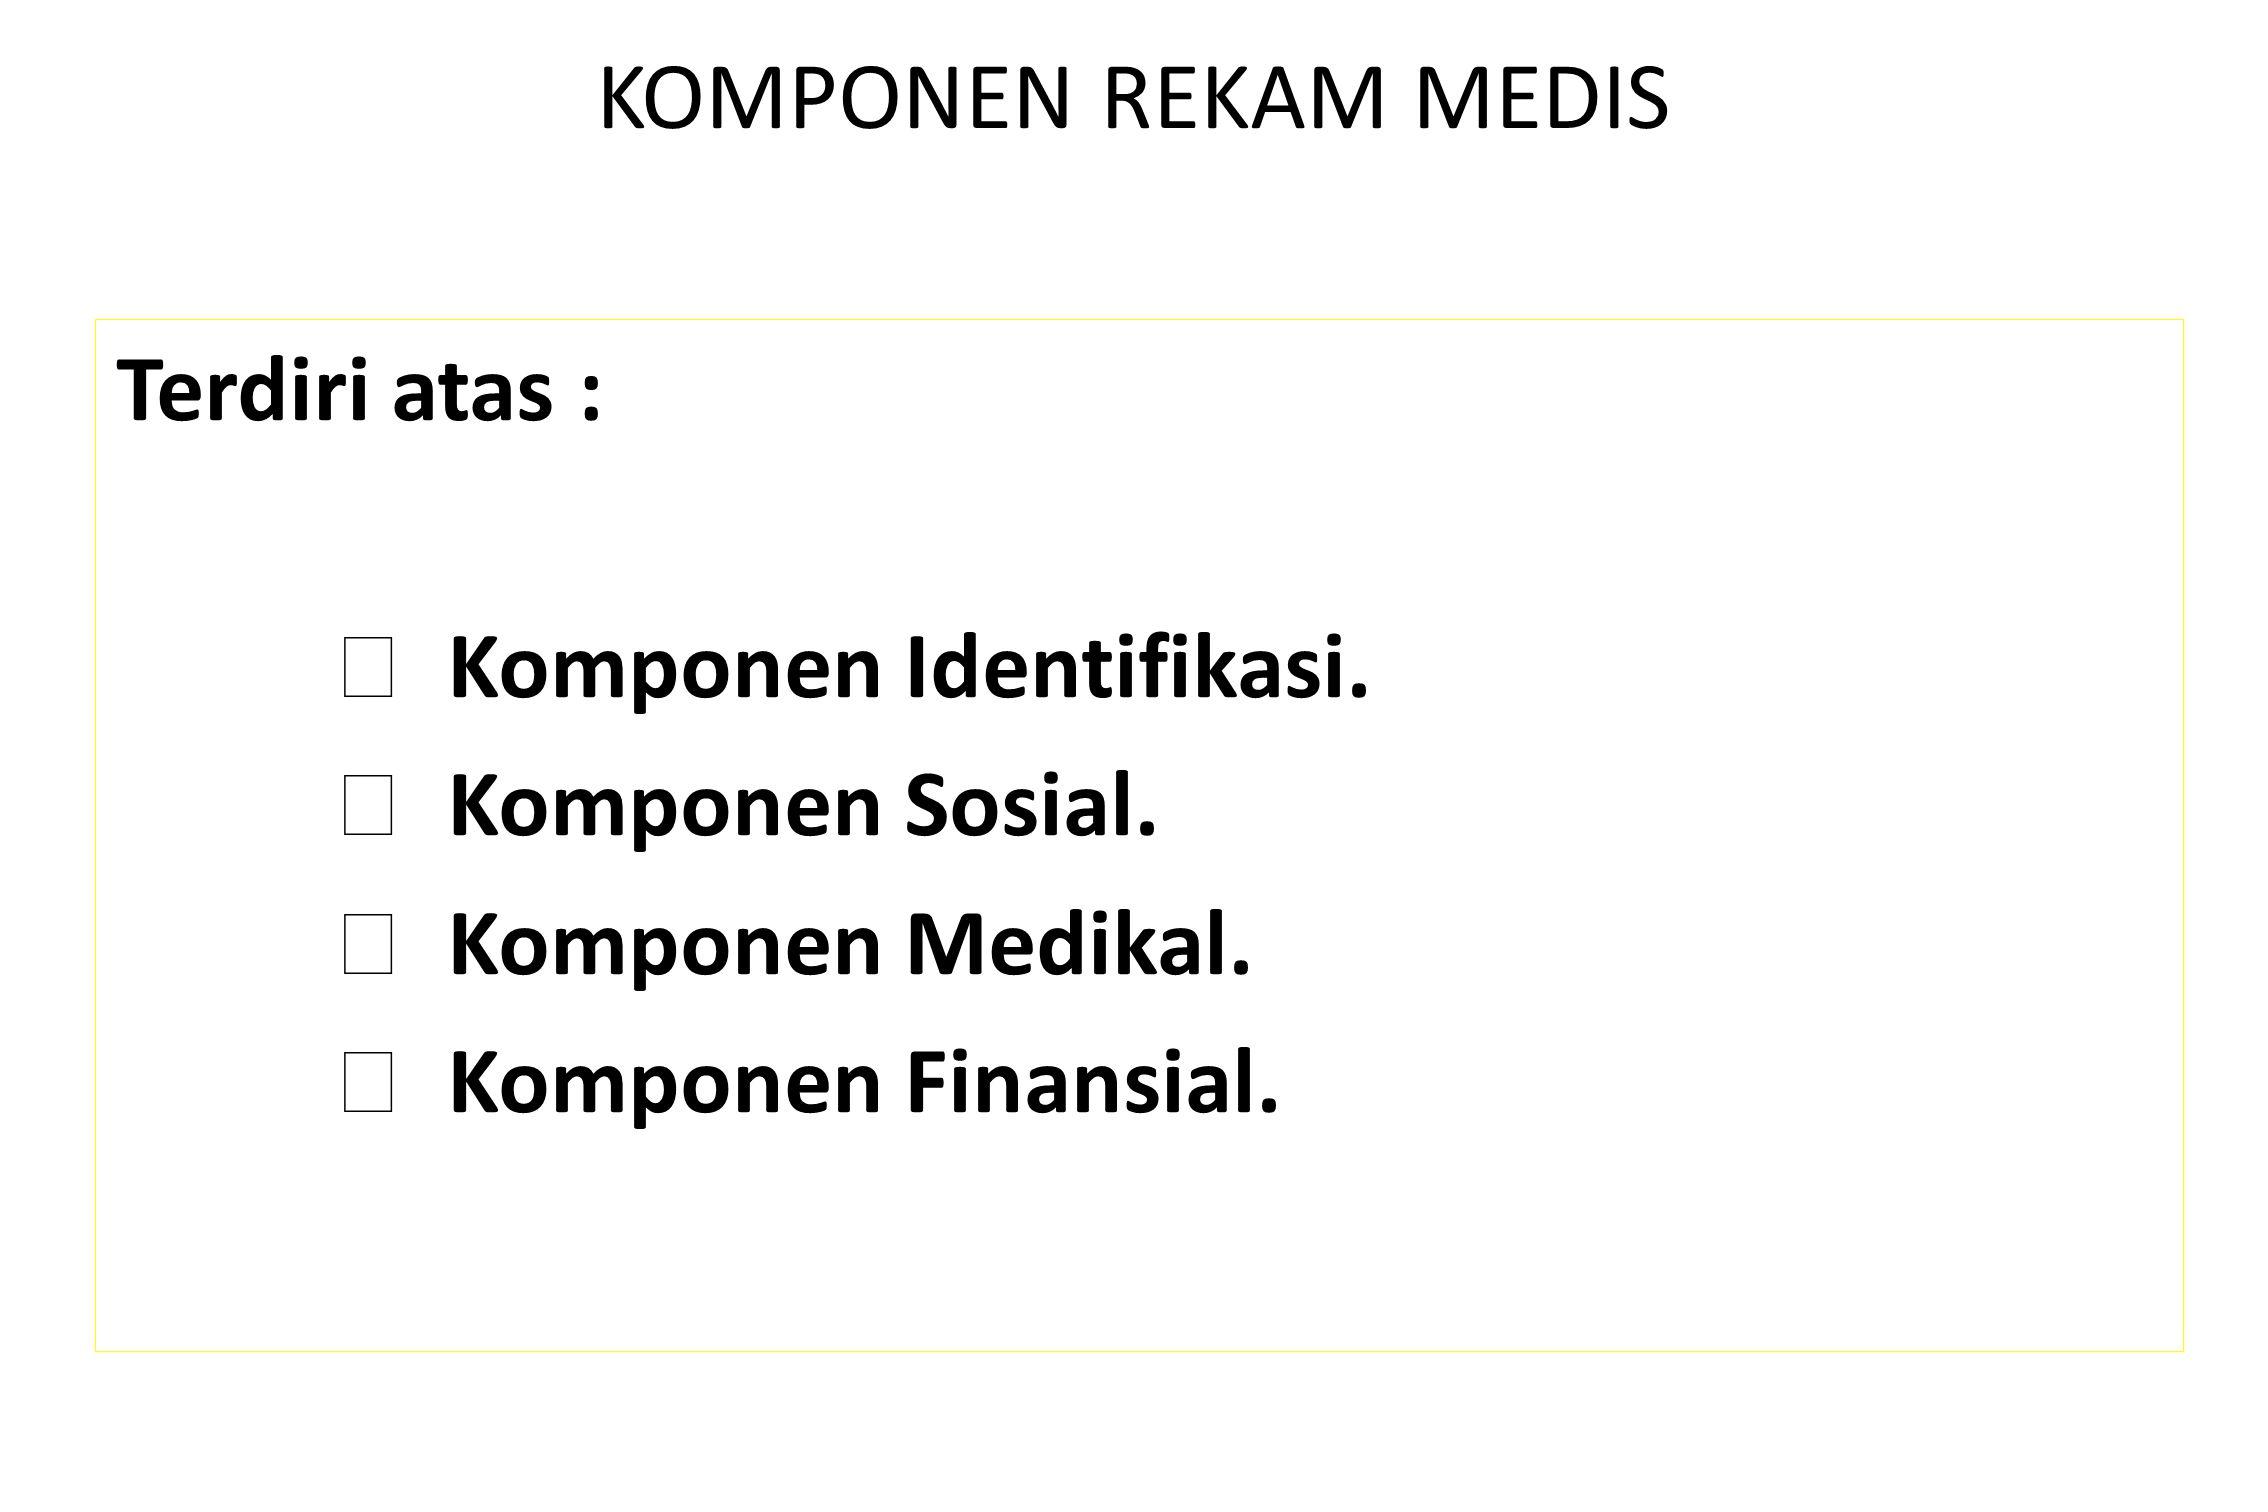 KOMPONEN REKAM MEDIS Terdiri atas :  Komponen Identifikasi.  Komponen Sosial.  Komponen Medikal.  Komponen Finansial.